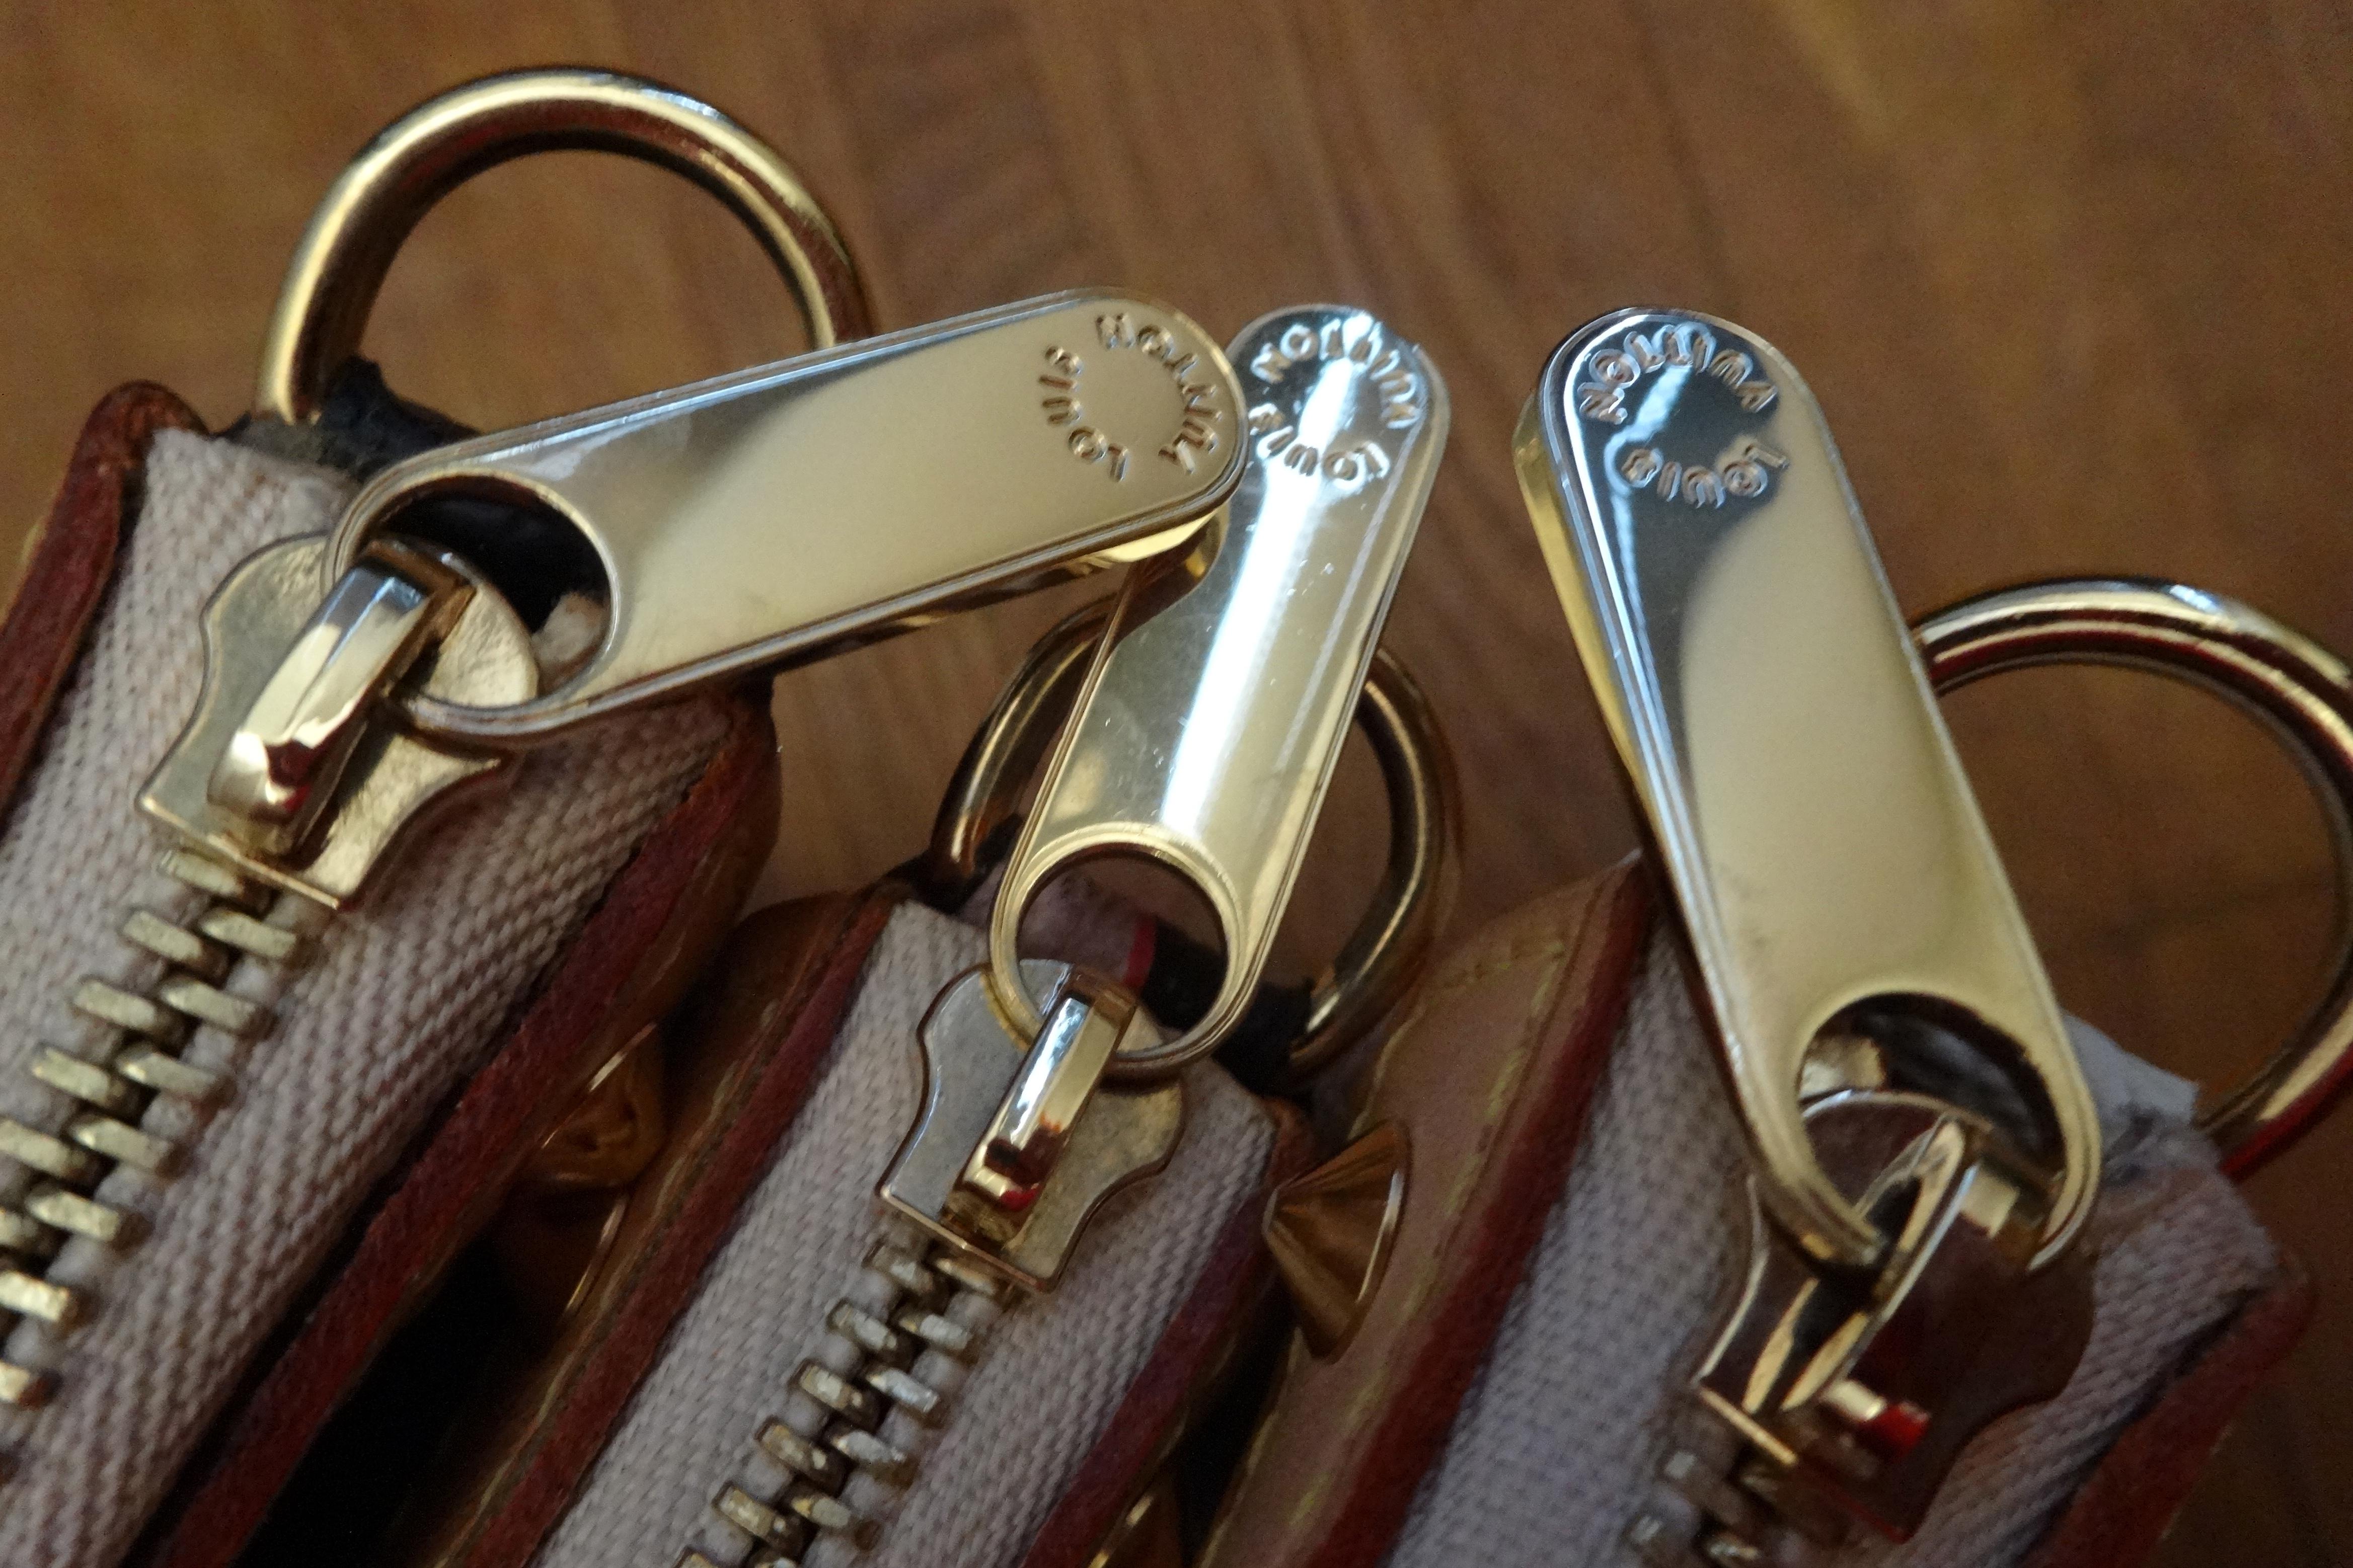 Zipper pulls of Murakami Pochette Accessoires -